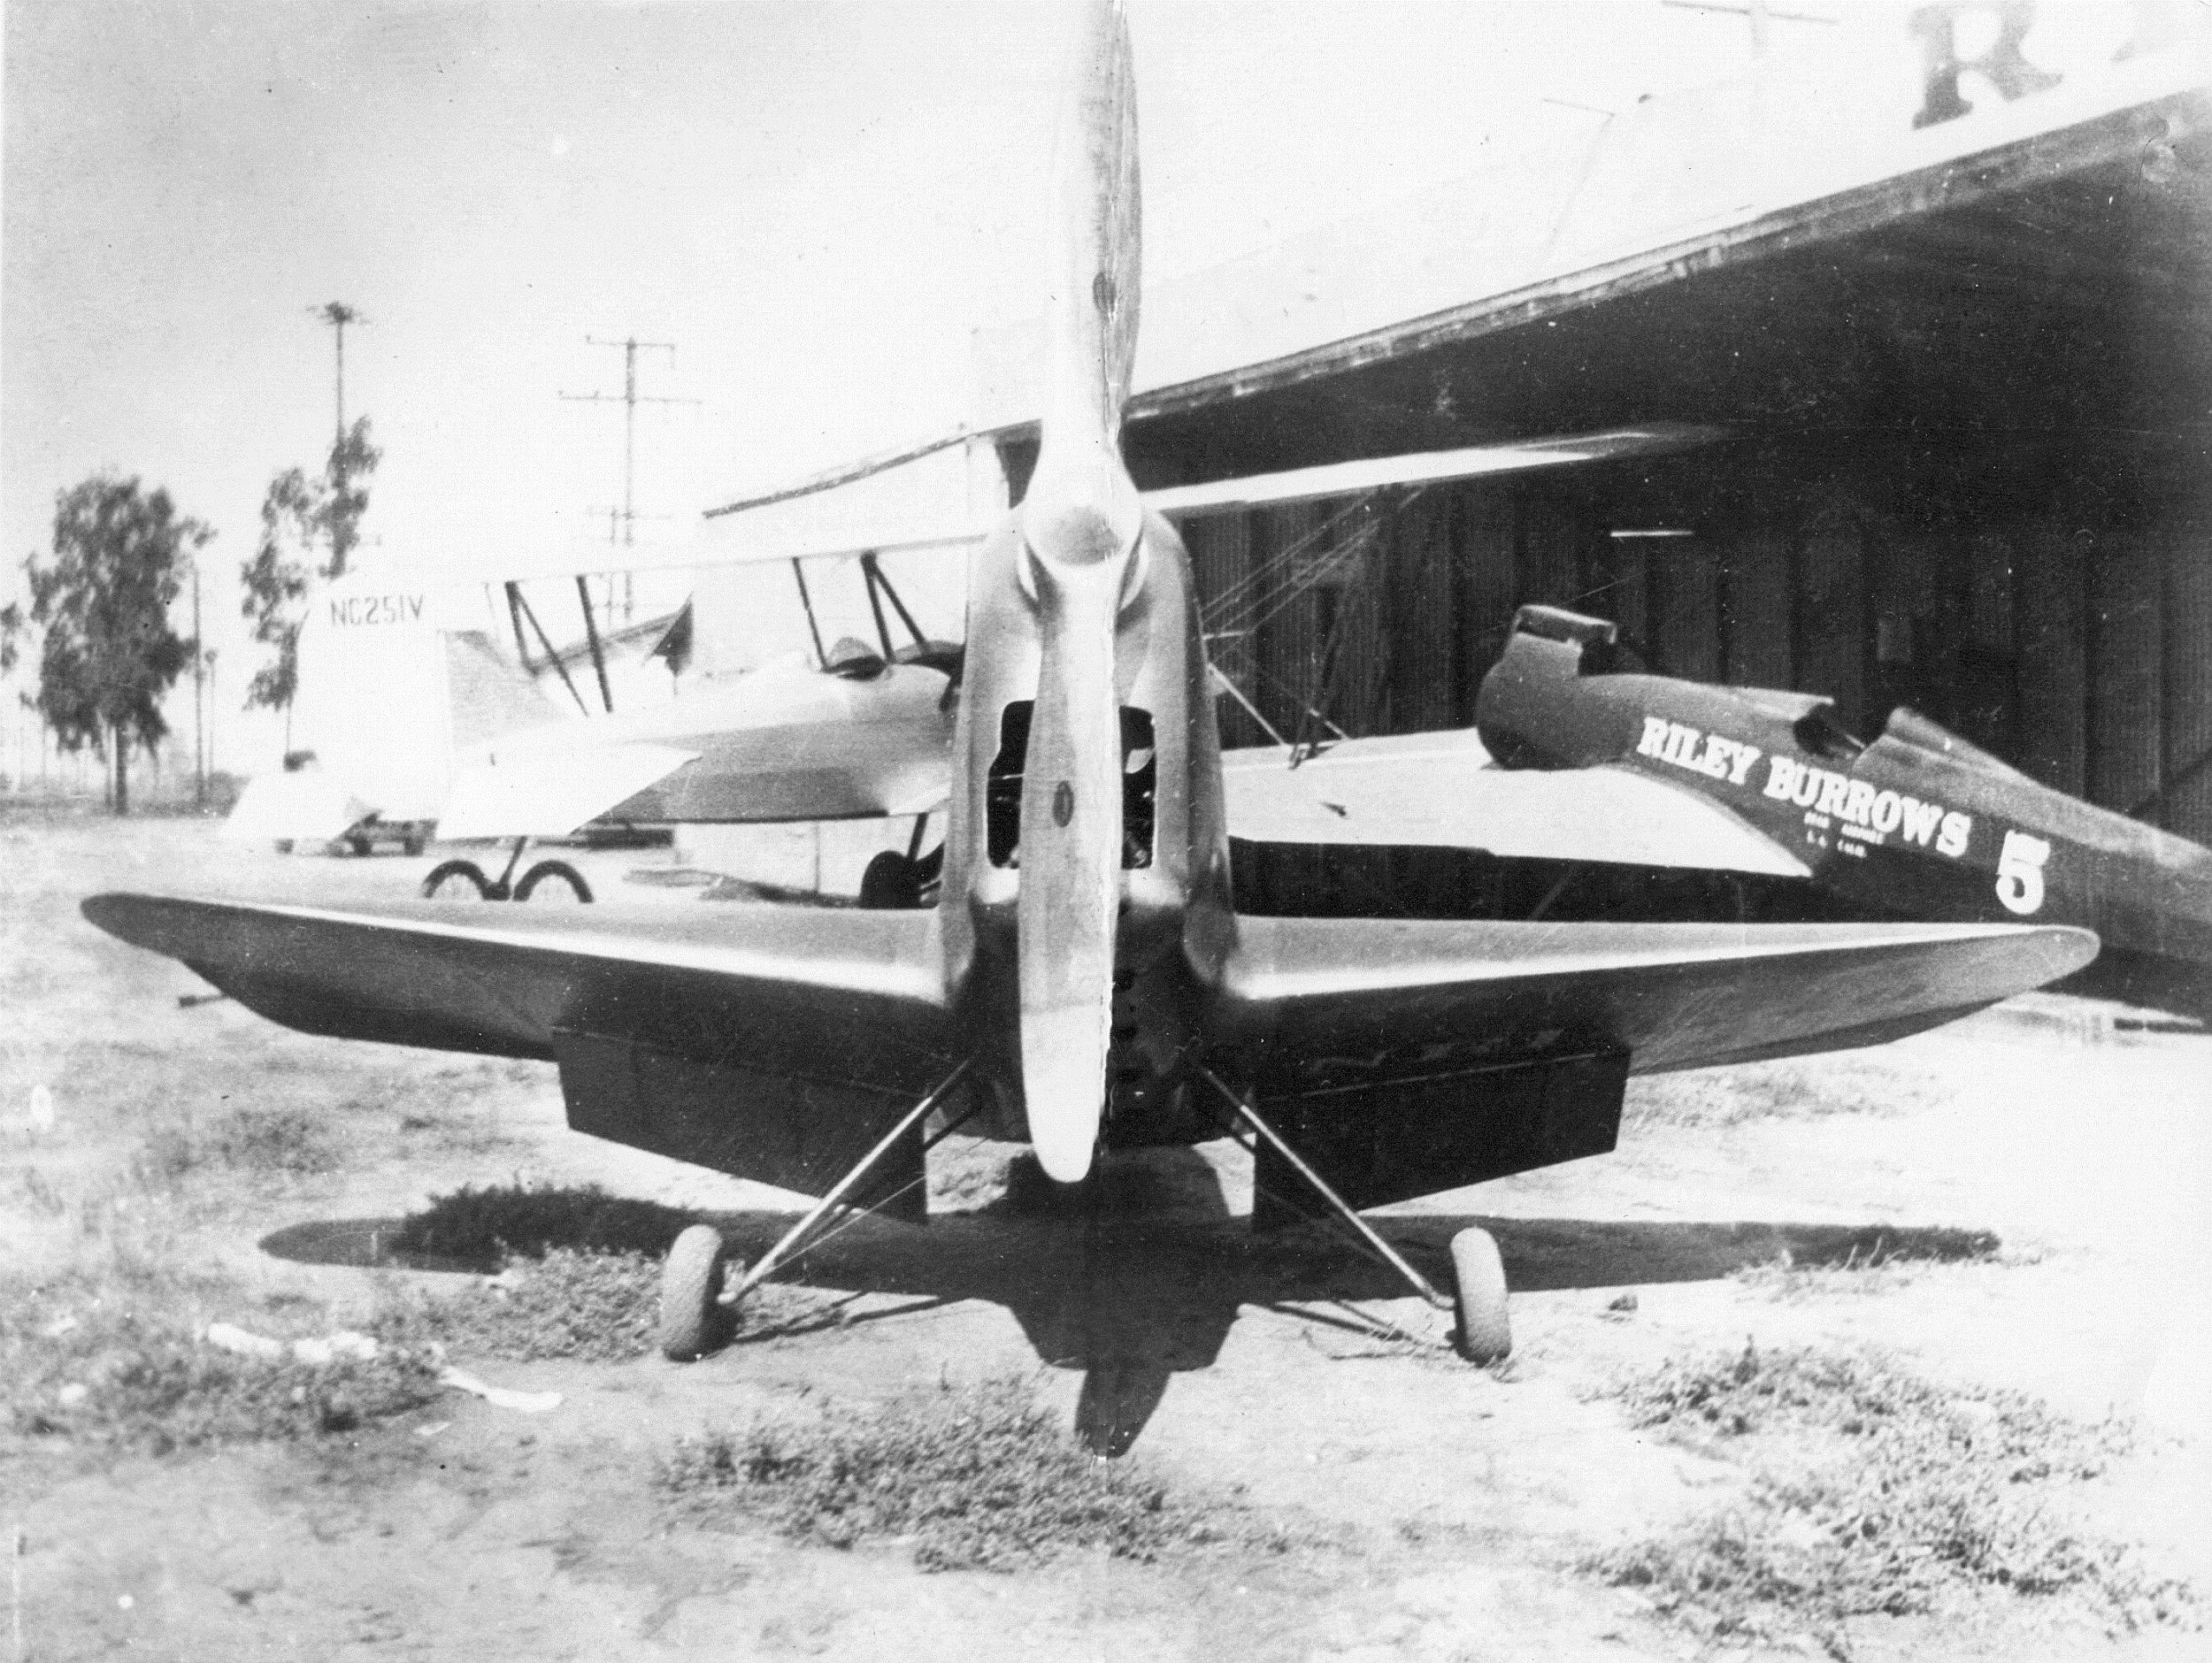 1934 Burrows R-5, NR214Y 120 hp Martin 333, four cylinder inverted